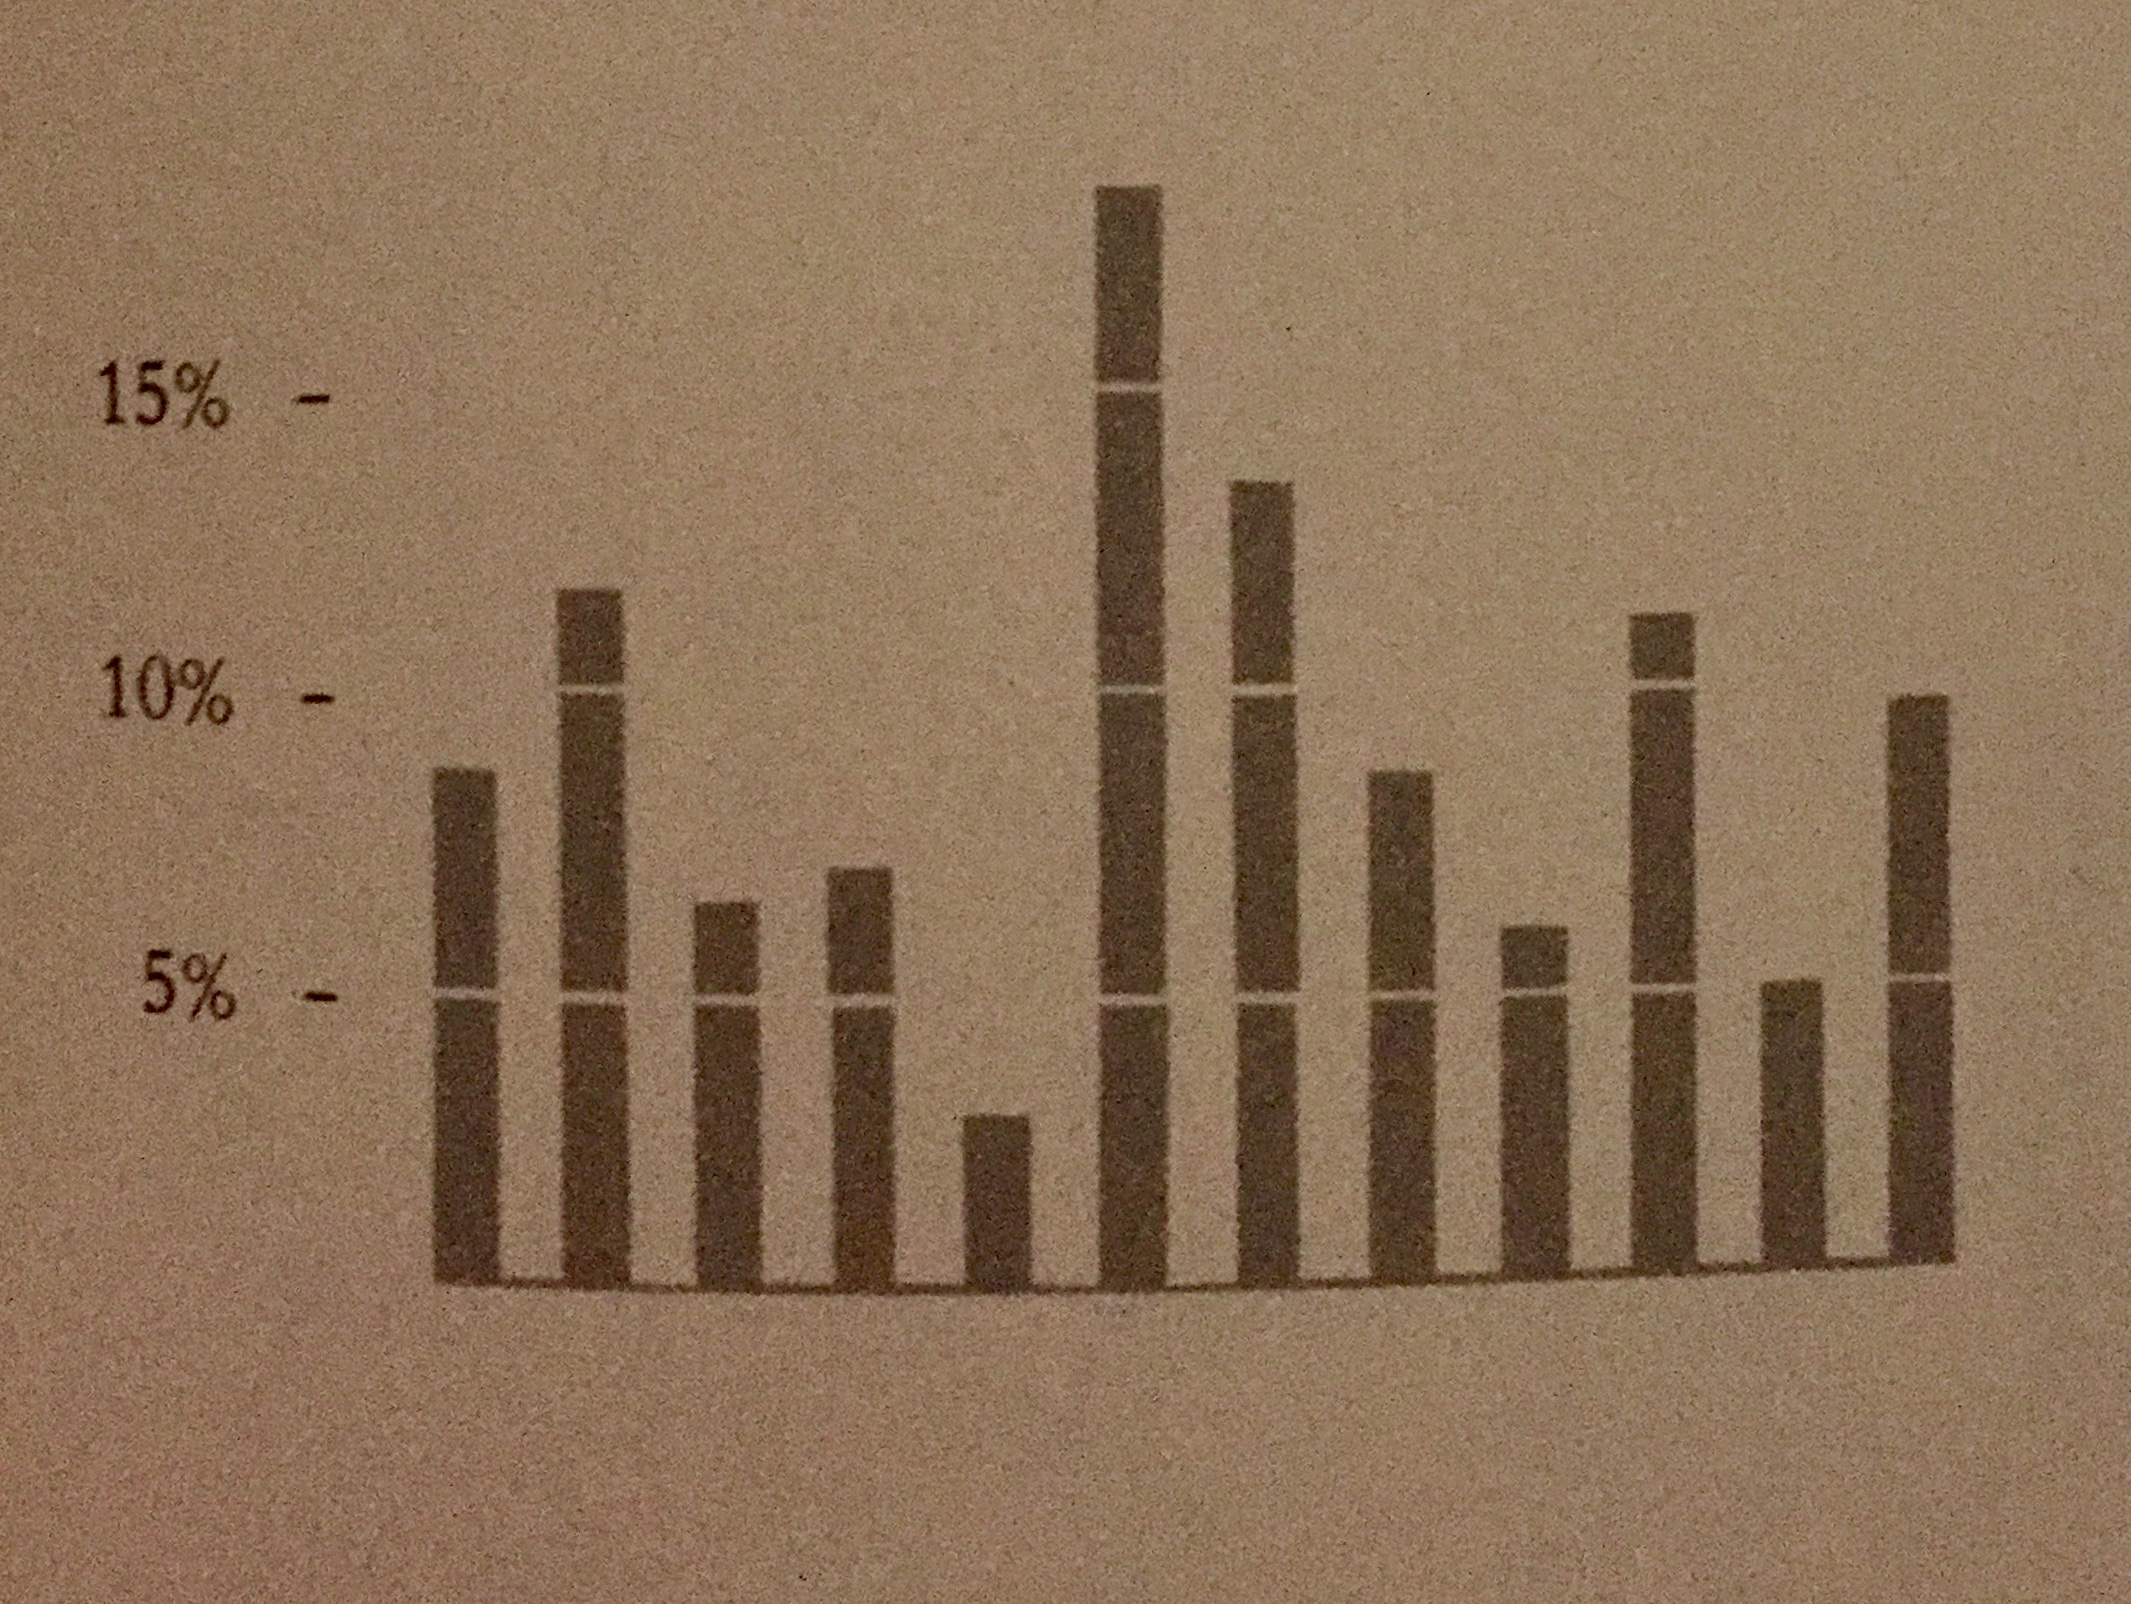 White grid lines through data.